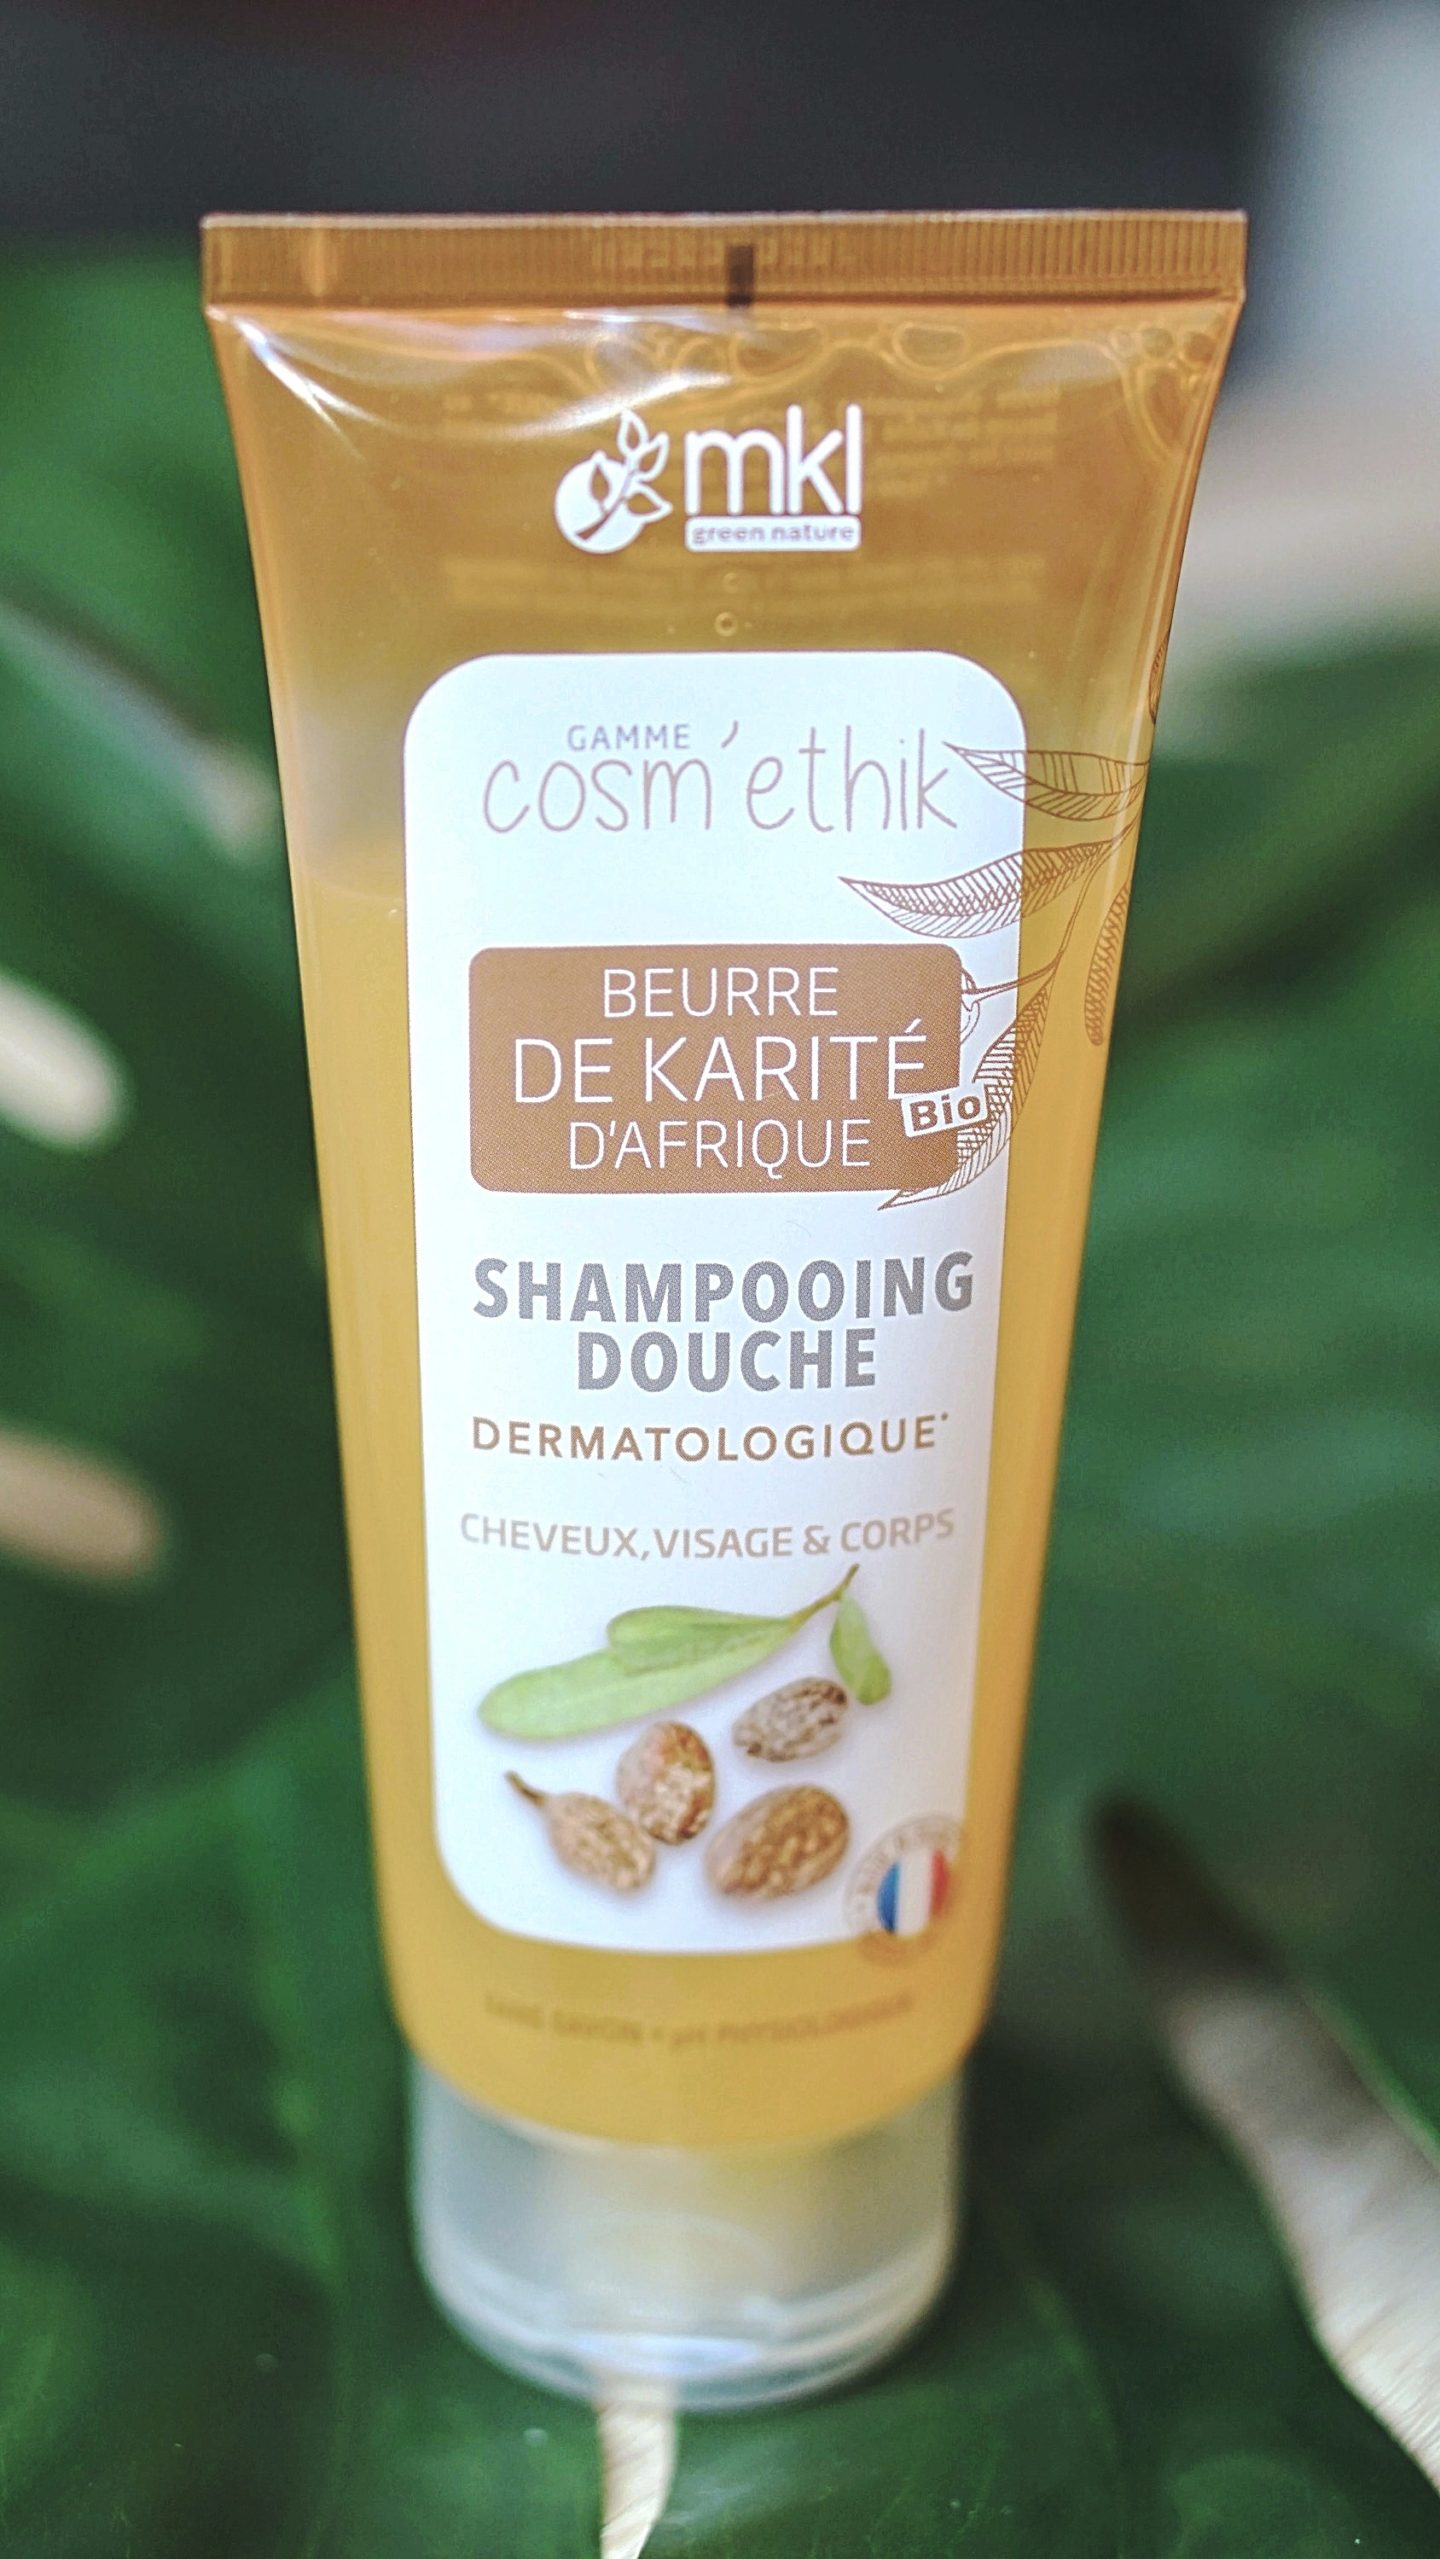 MKL Green Nature Cosm'ethik Shampooing Douche Aloe Vera Karité